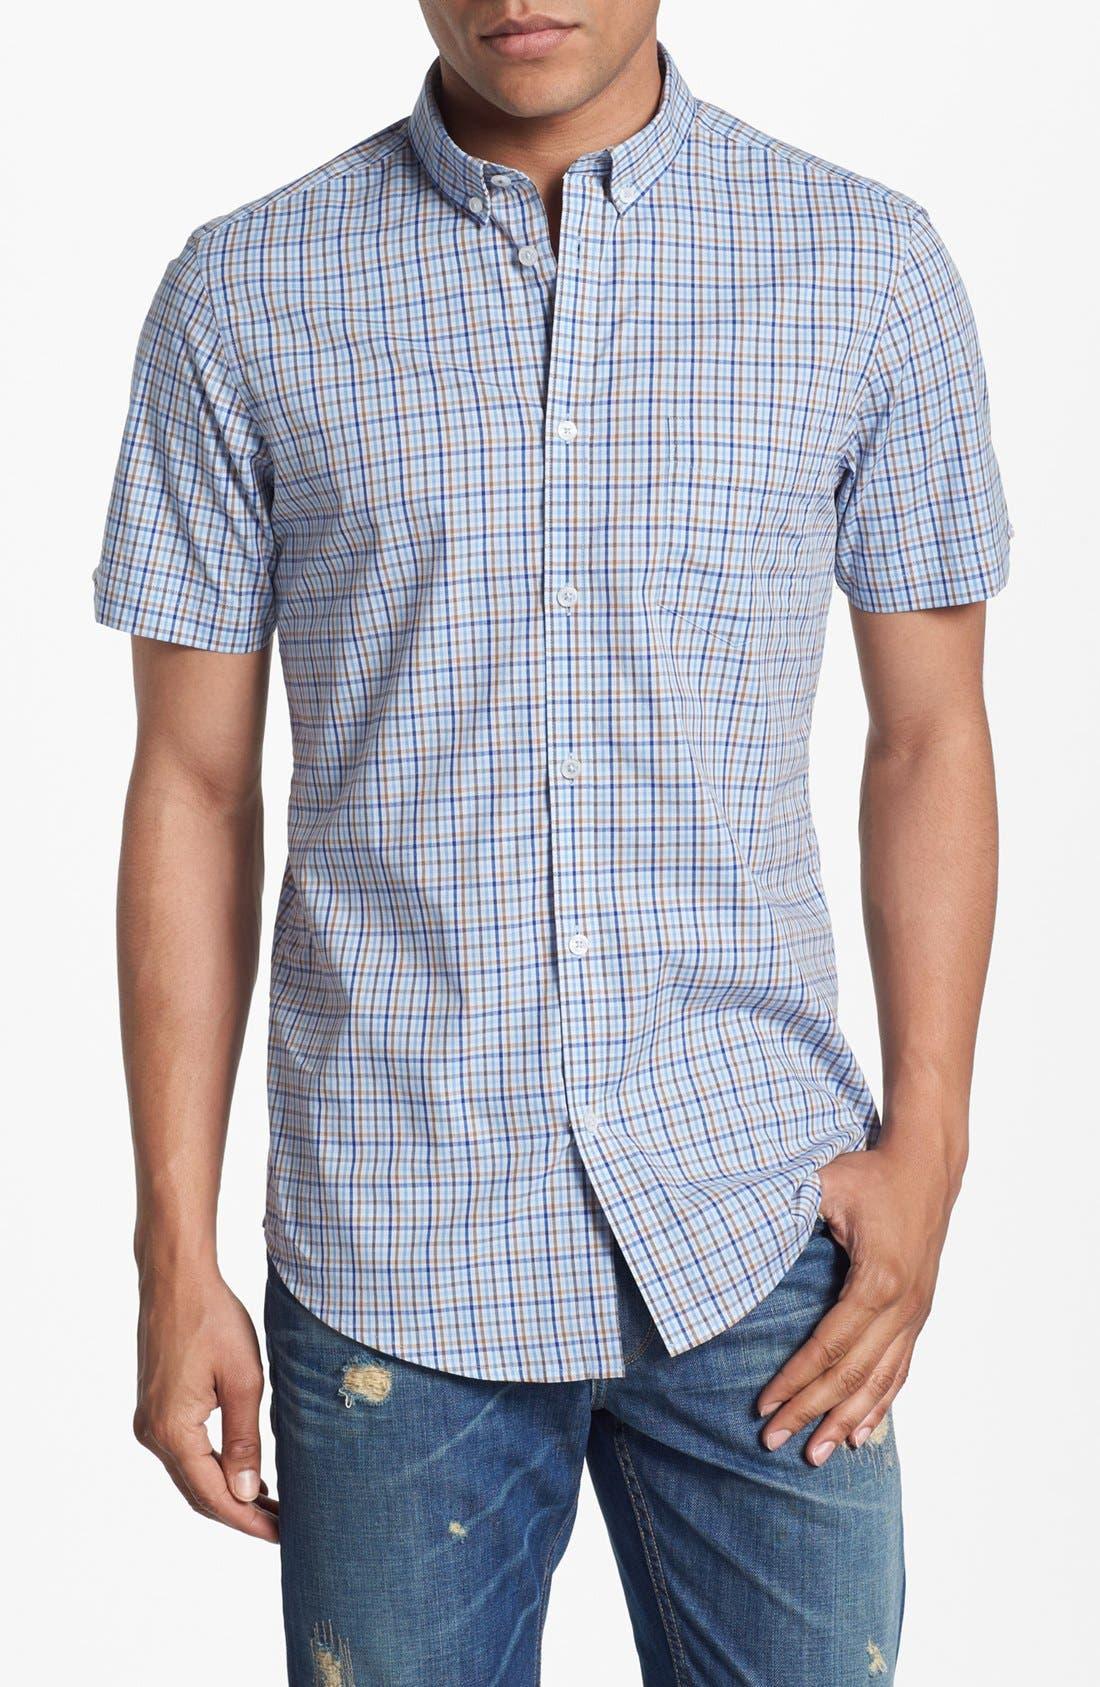 Main Image - Ben Sherman Check Short Sleeve Woven Shirt